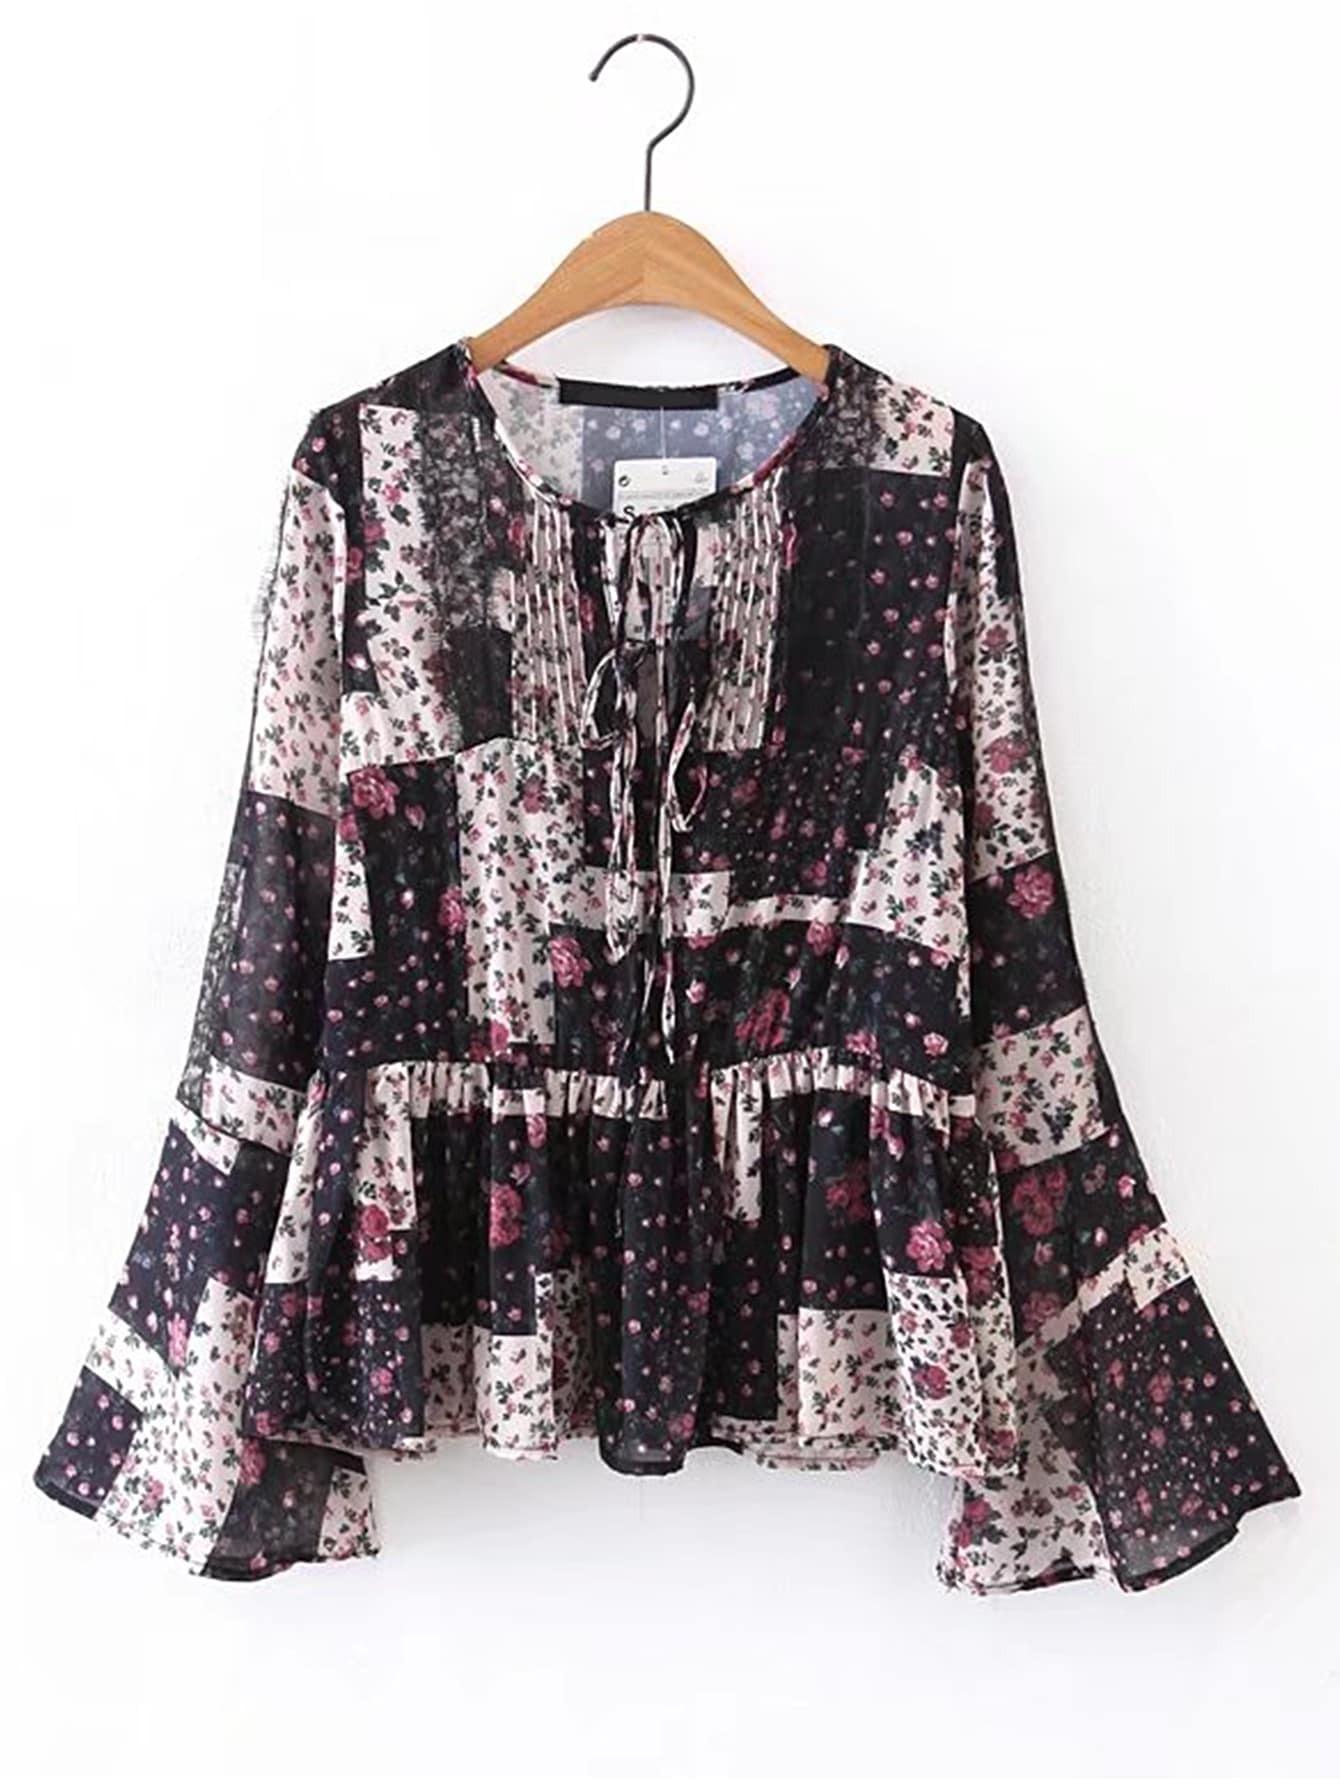 Bell Sleeve Ruffle Hem Lace Up Blouse blouse170427208